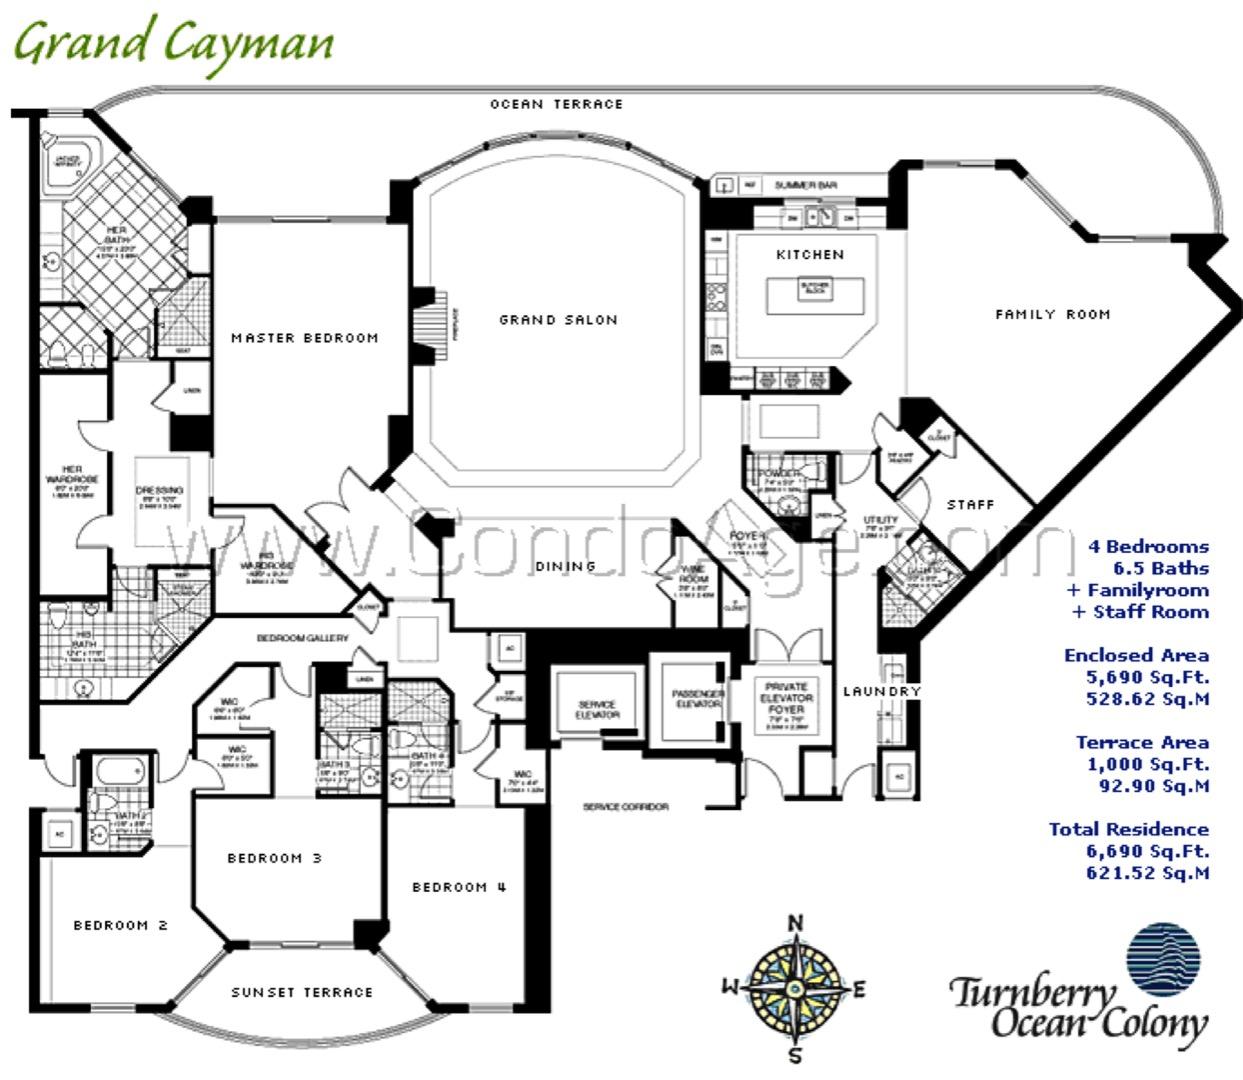 Floor plan image Grand Cayman - 4/6/2  - 5690 sqft image